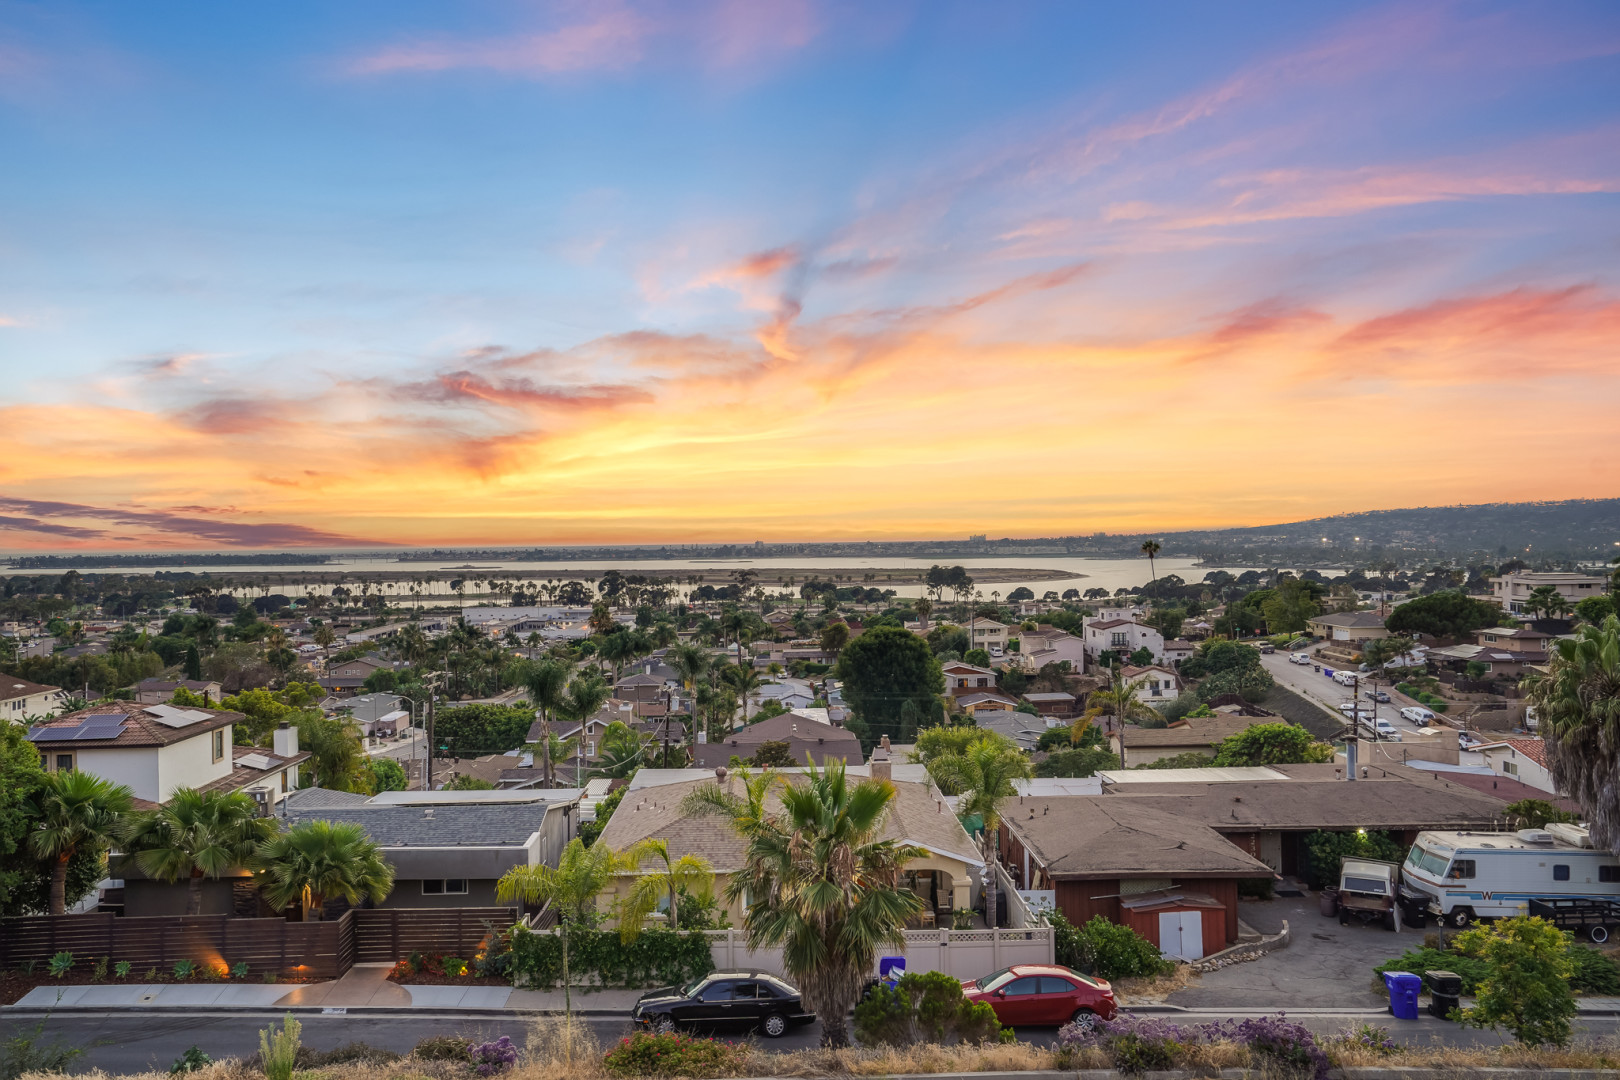 2221 Hartford St, San Diego, California 92110